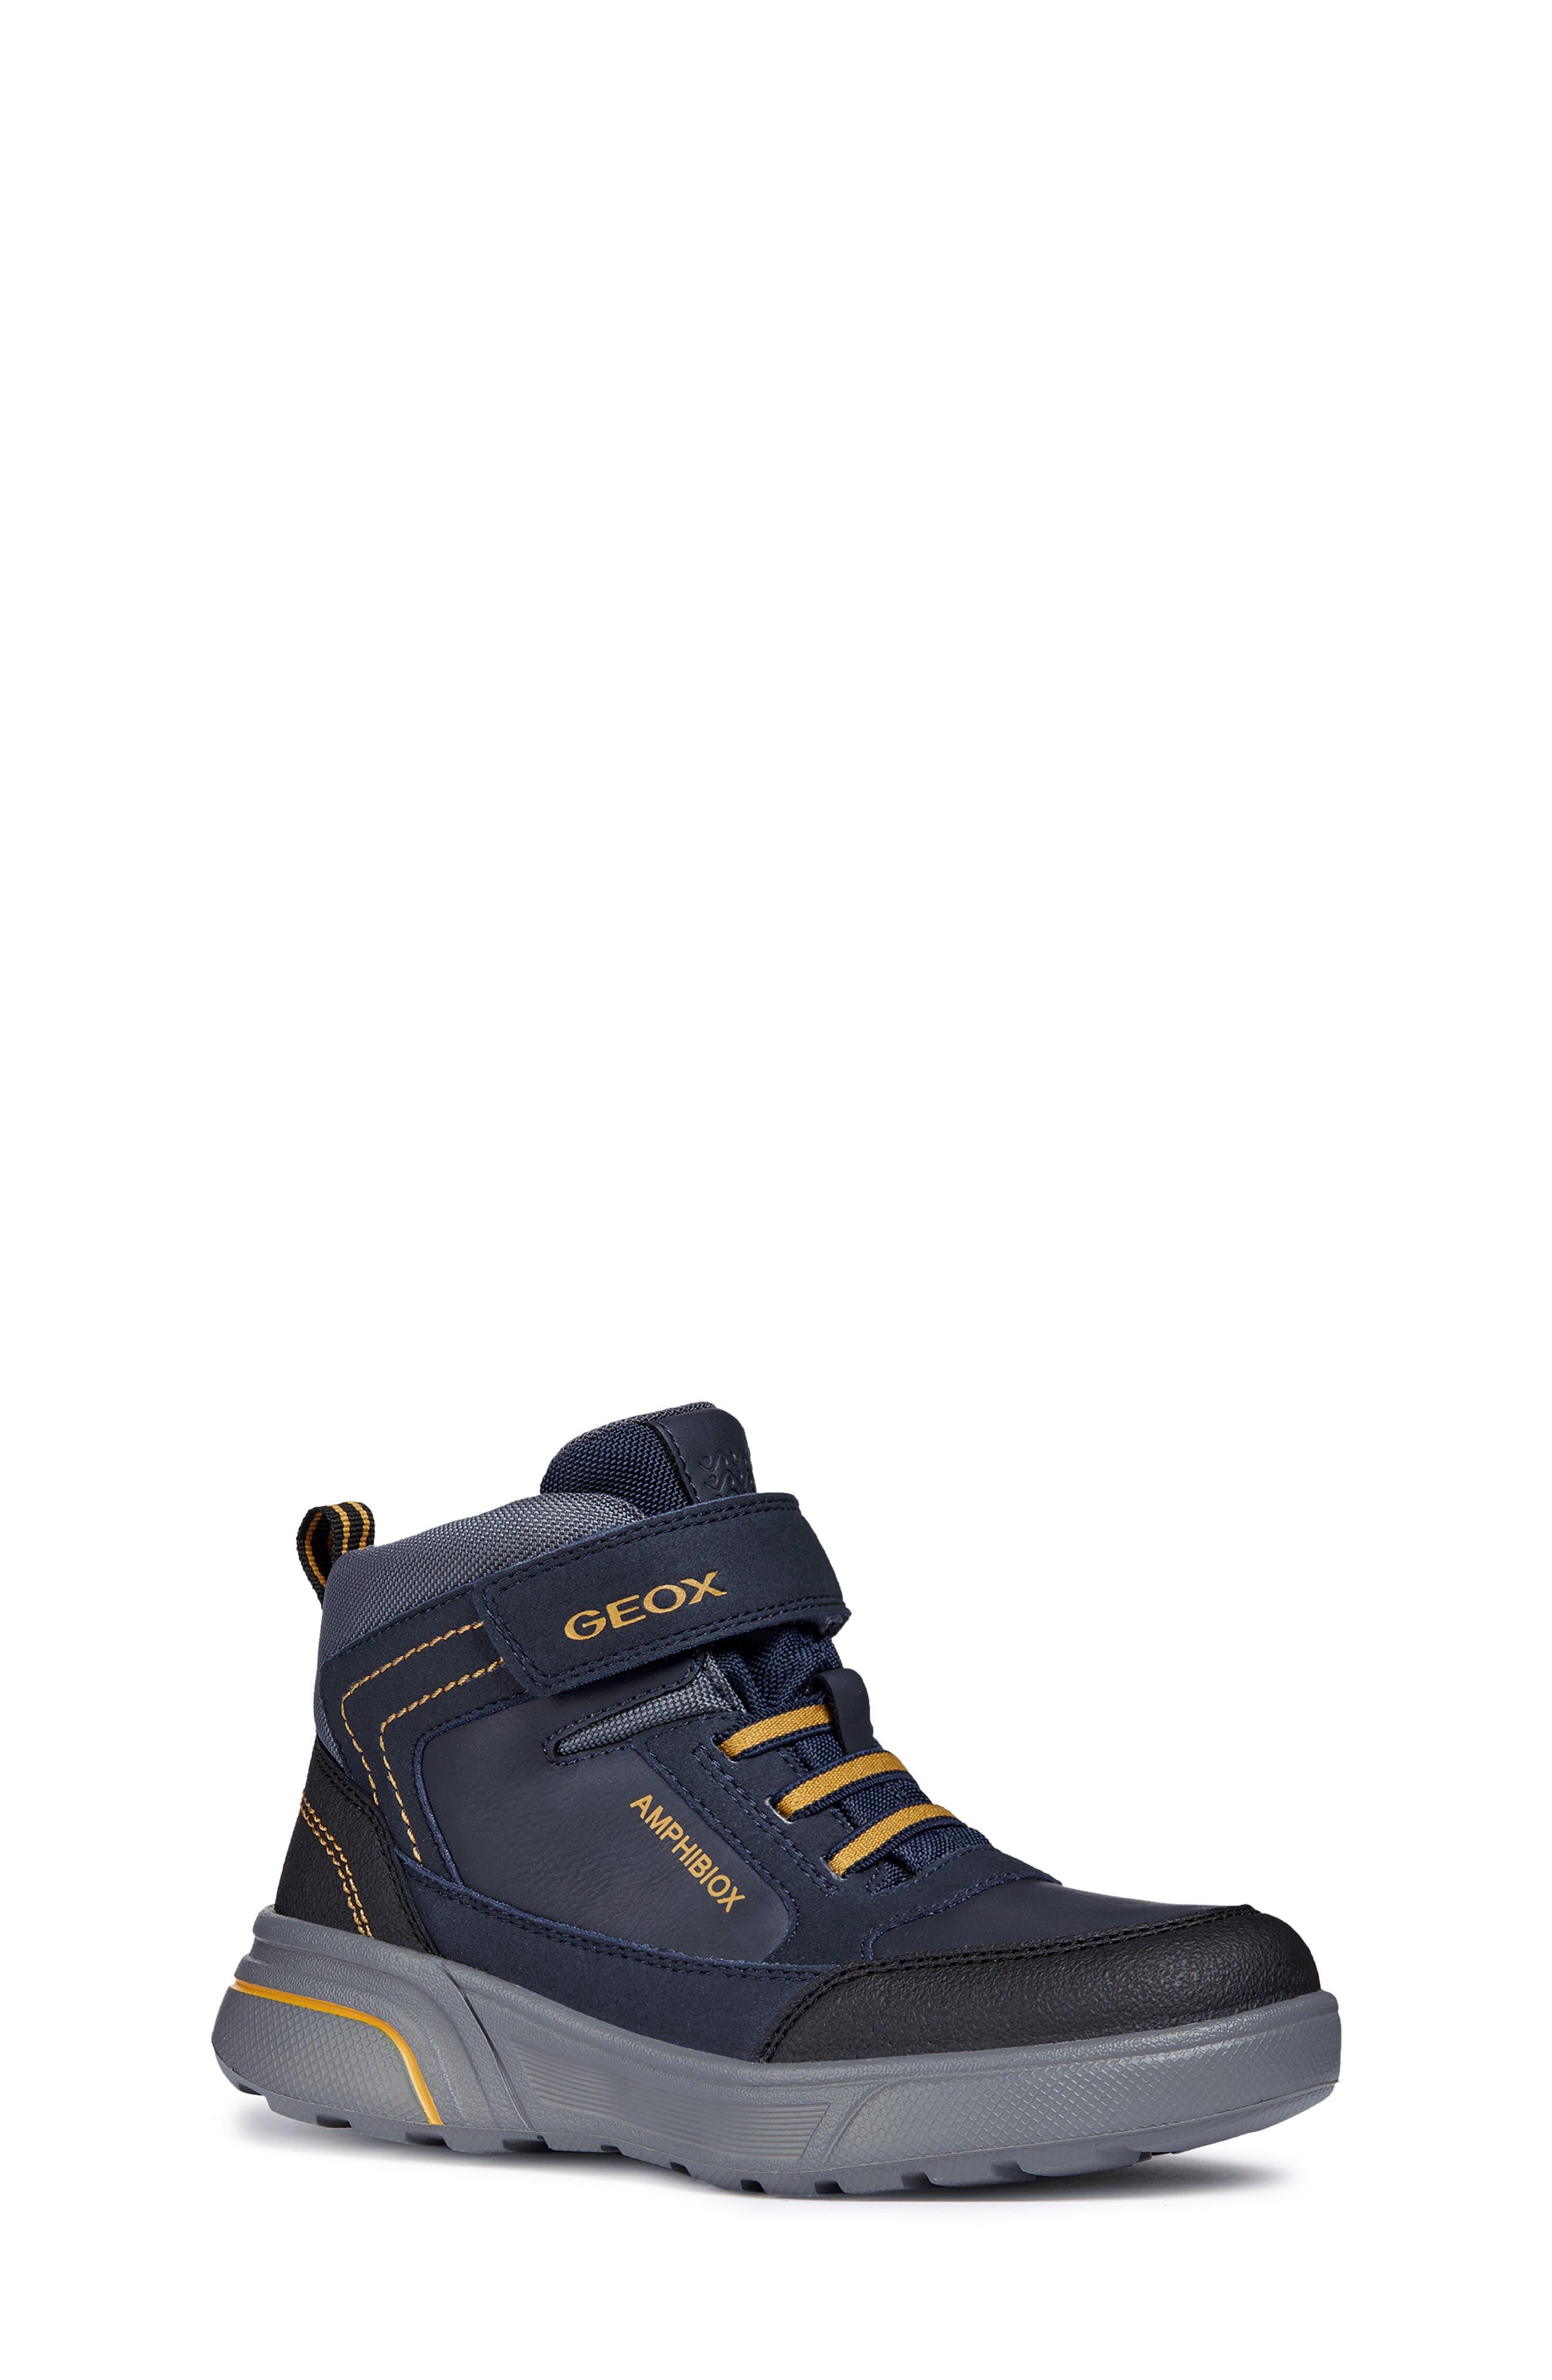 Sveggen ABX Waterproof Sneaker,                             Main thumbnail 1, color,                             NAVY/YELLOW